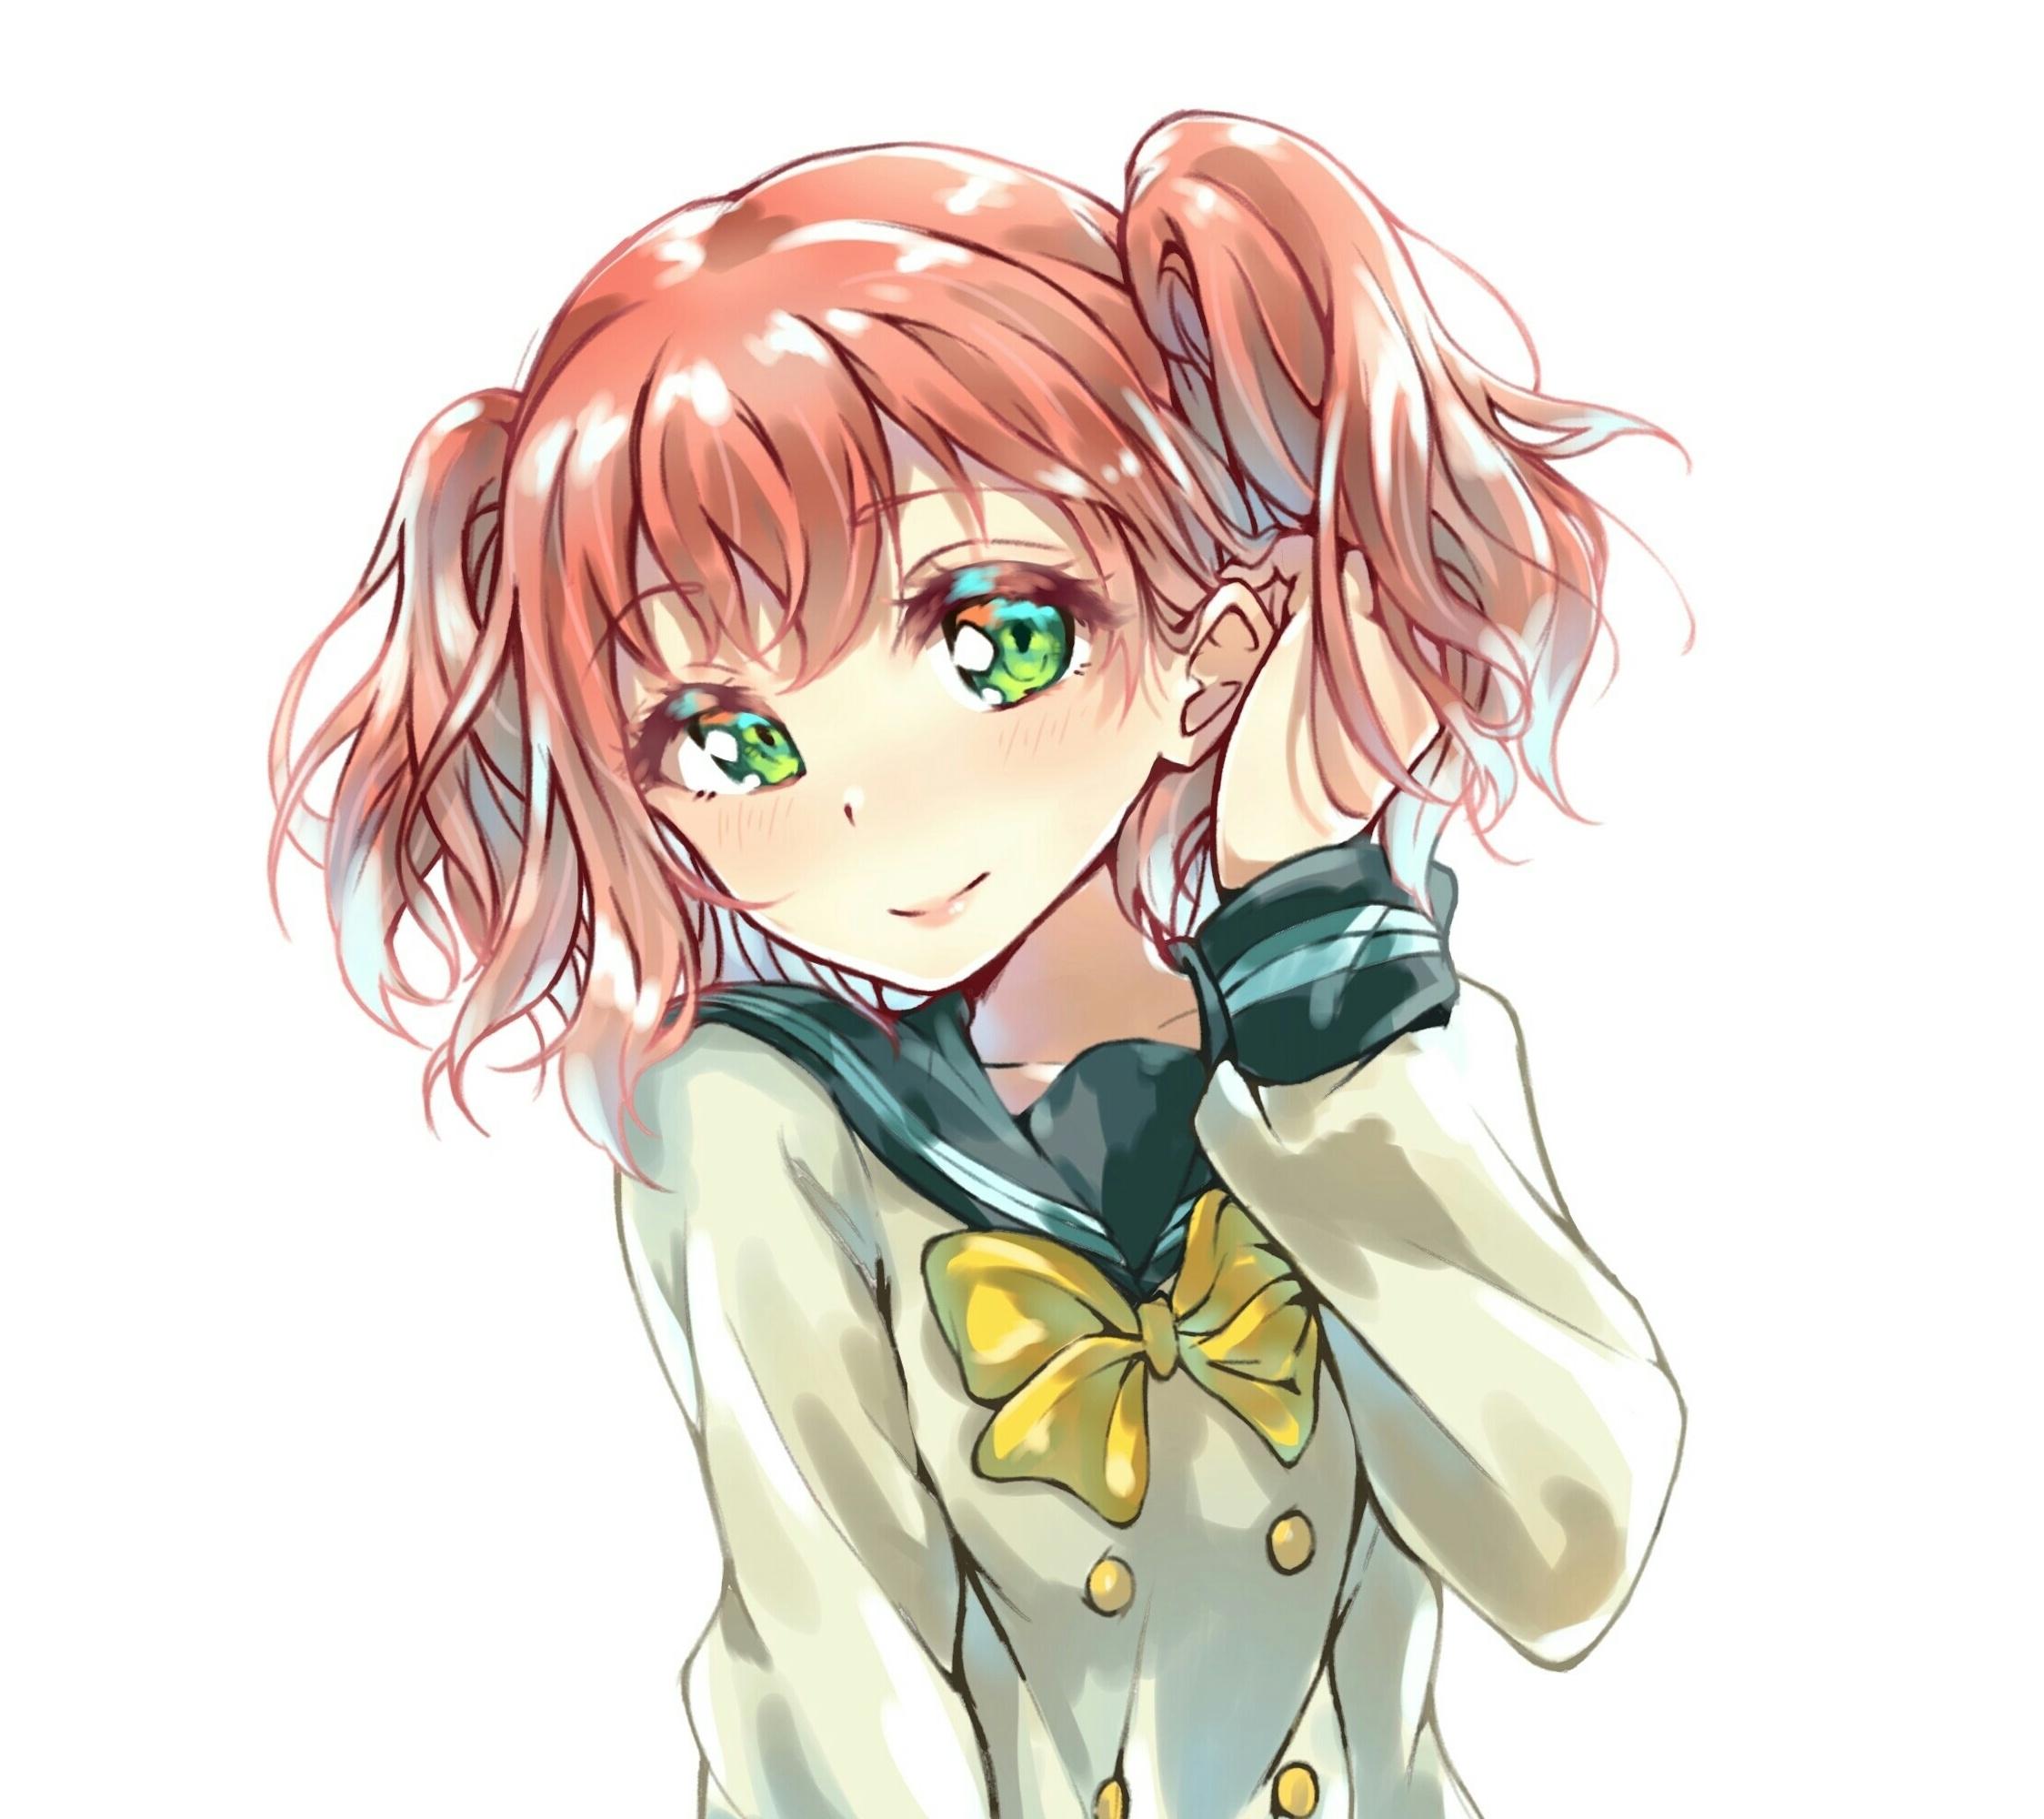 Shy Love Live Ruby Kurosawa Anime Girl 2248x2248 Wallpaper